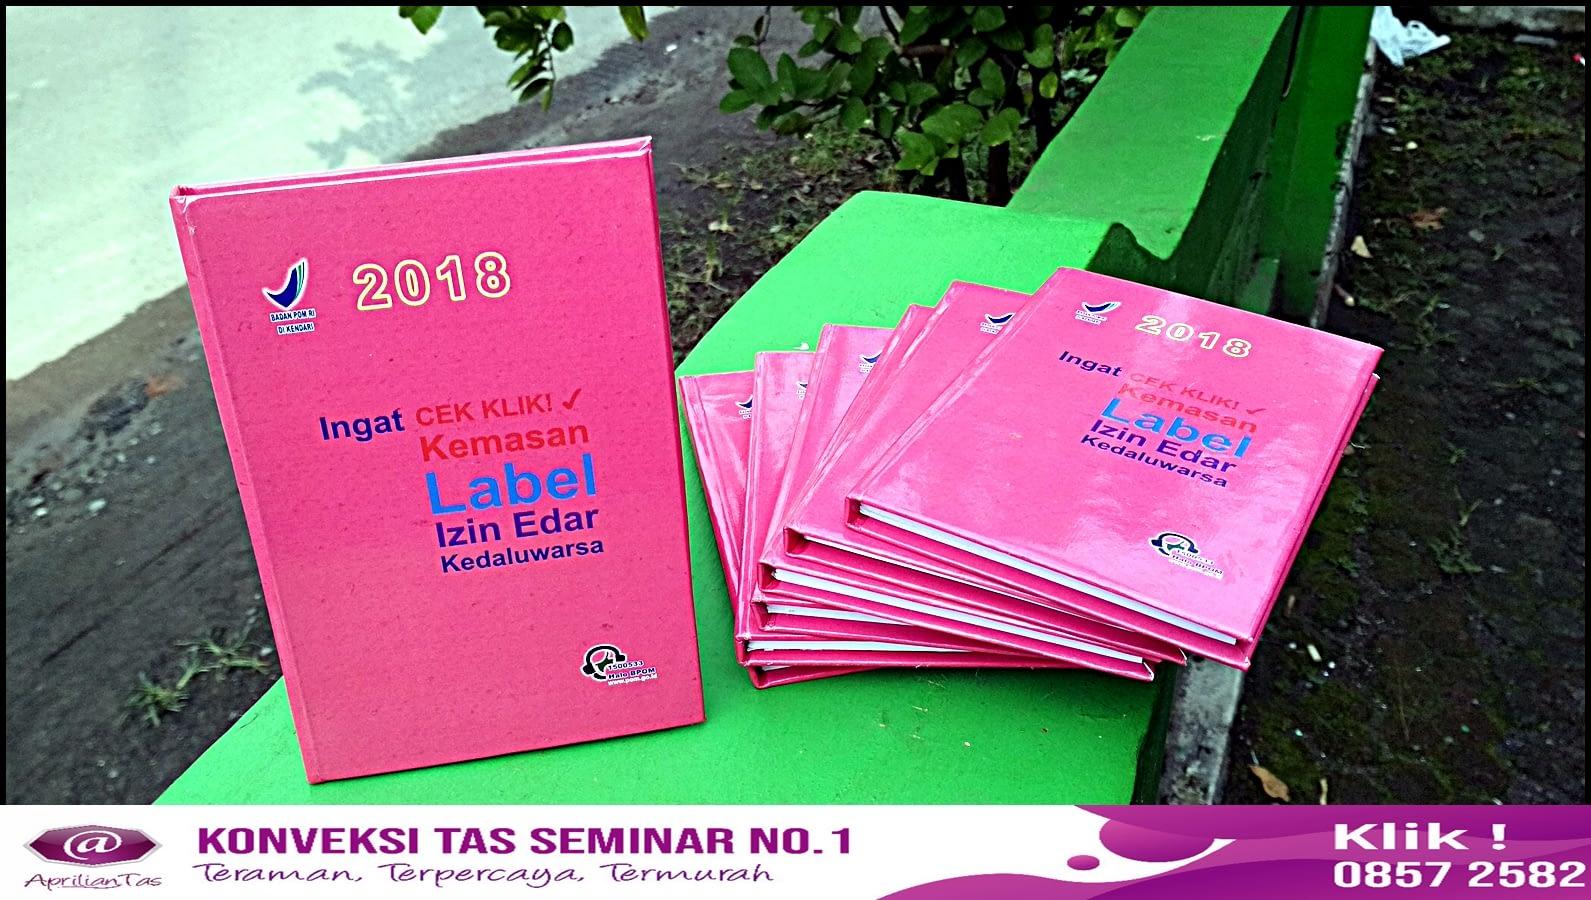 Supplier Tas Seminar Kit Terjangkau Order Pelatihan Terbaik Bandung Harga tas seminar,tas seminar indonesia,tas seminar jakarta pusat,konveksi tas seminar,